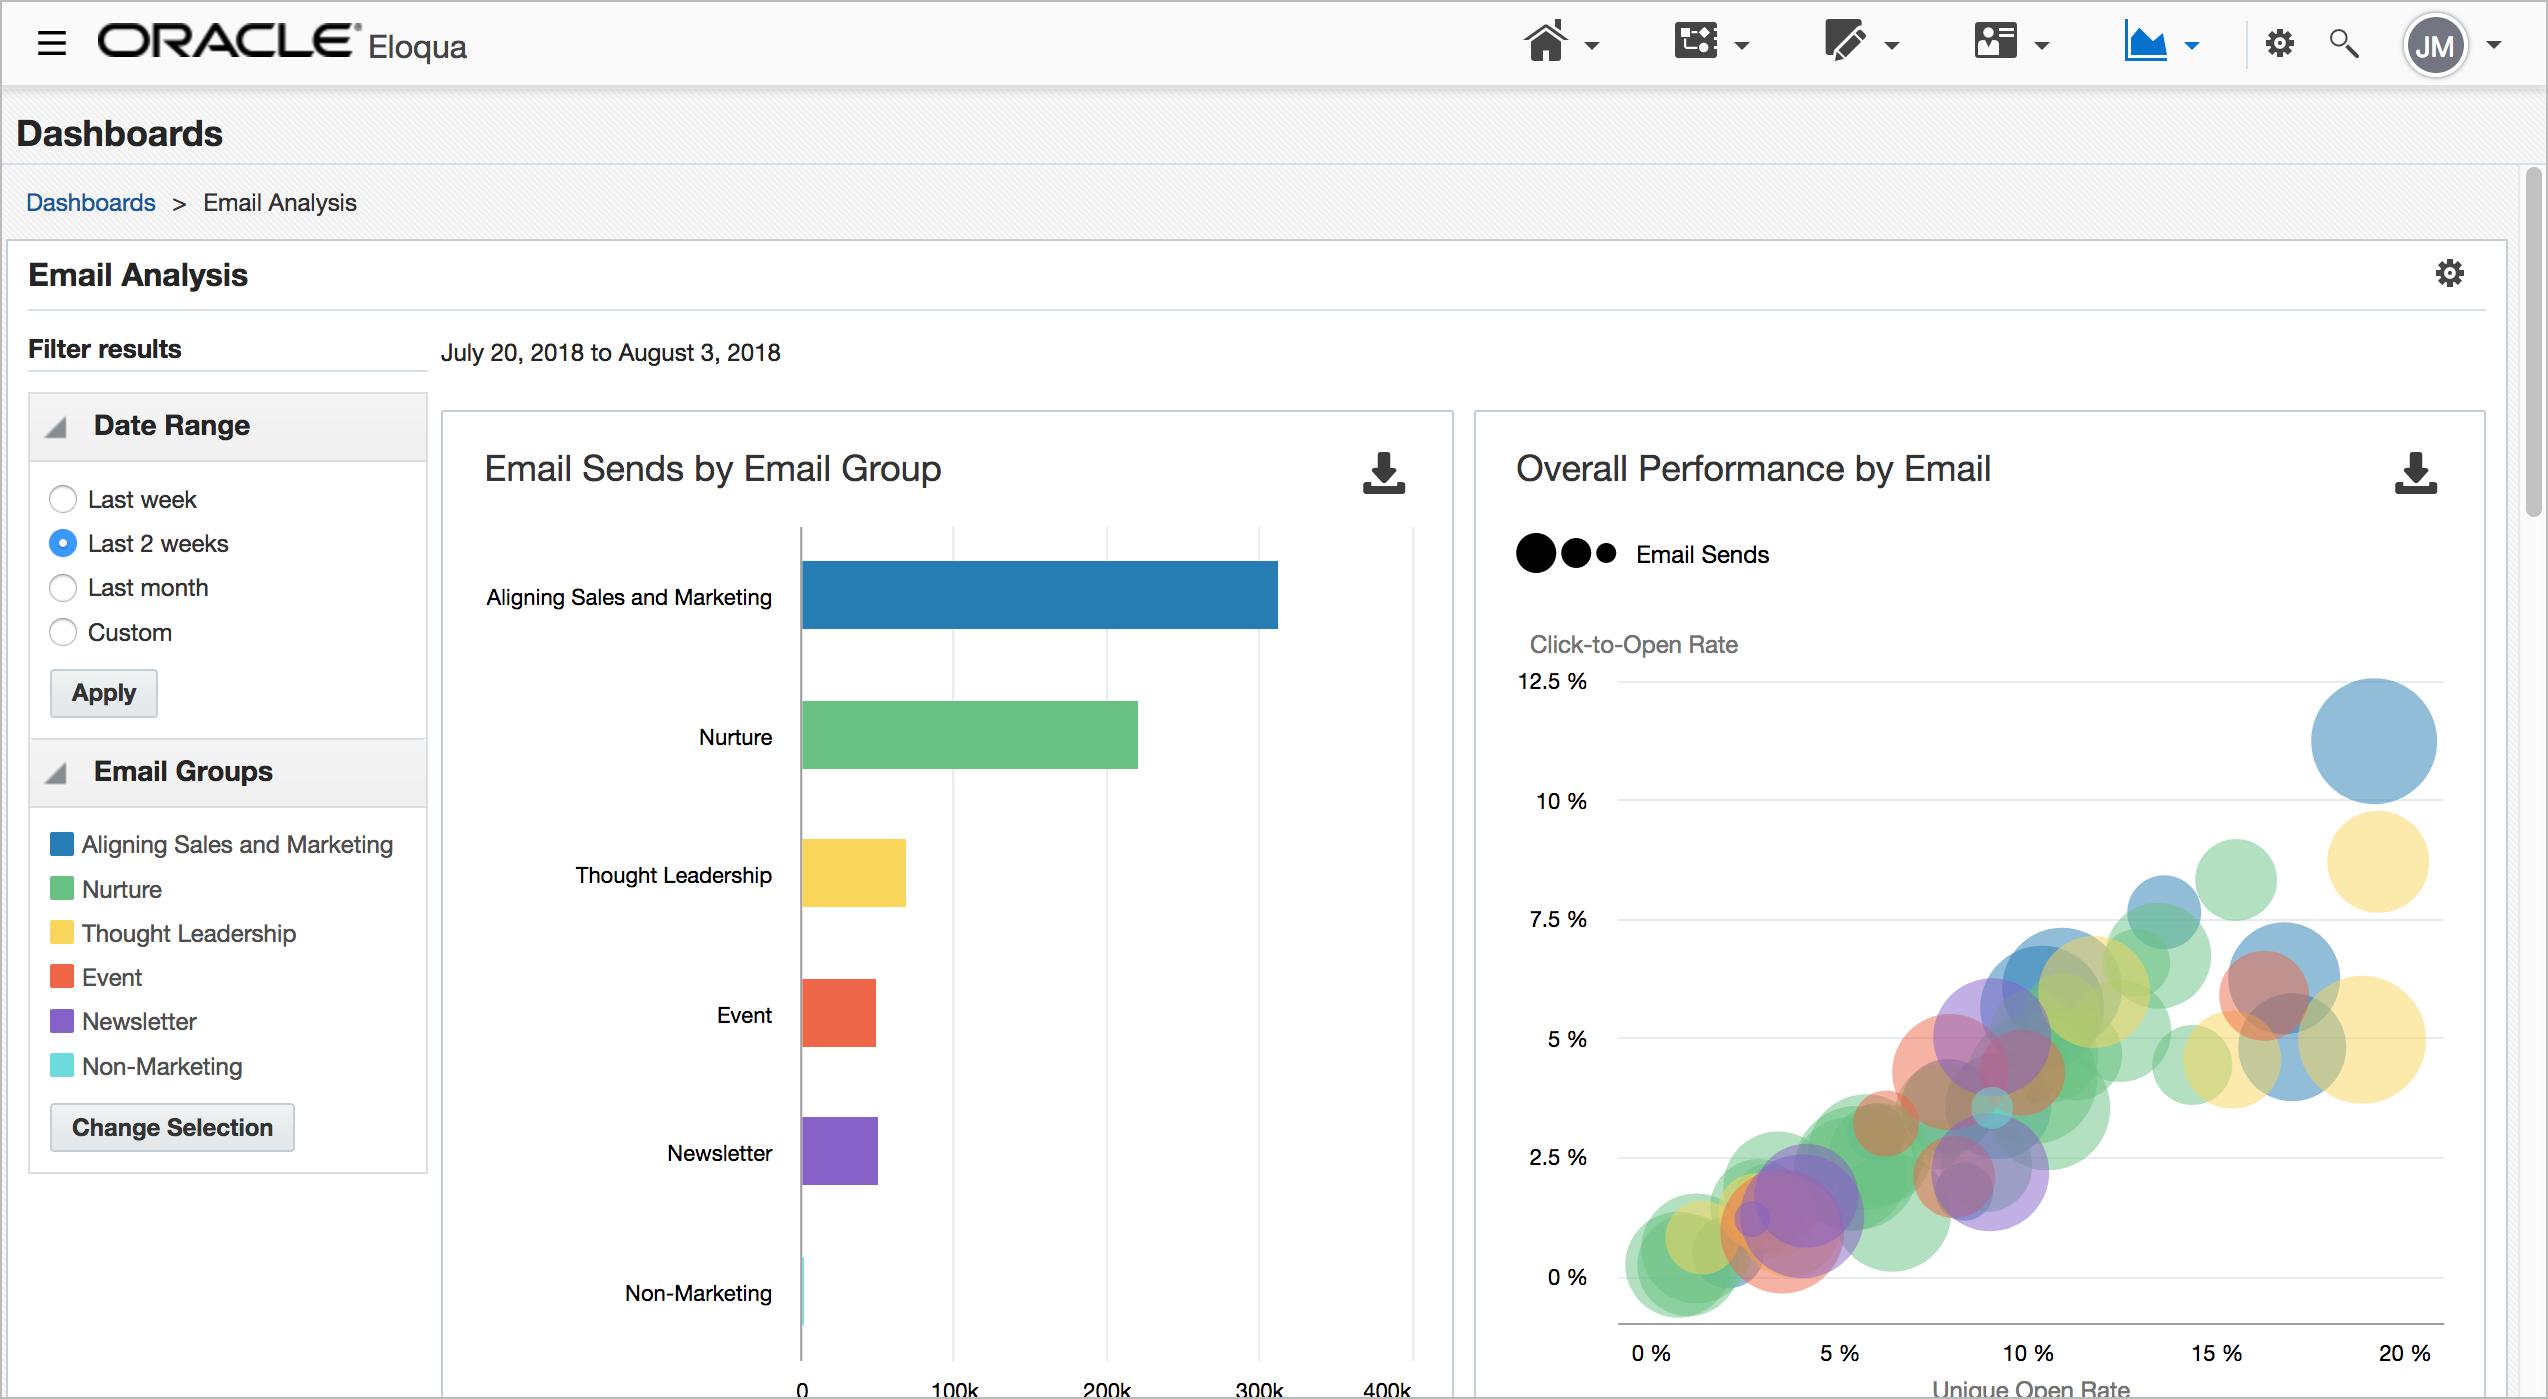 Oracle Eloqua Demo - Next Generation Analytics To Measure Marketing Success